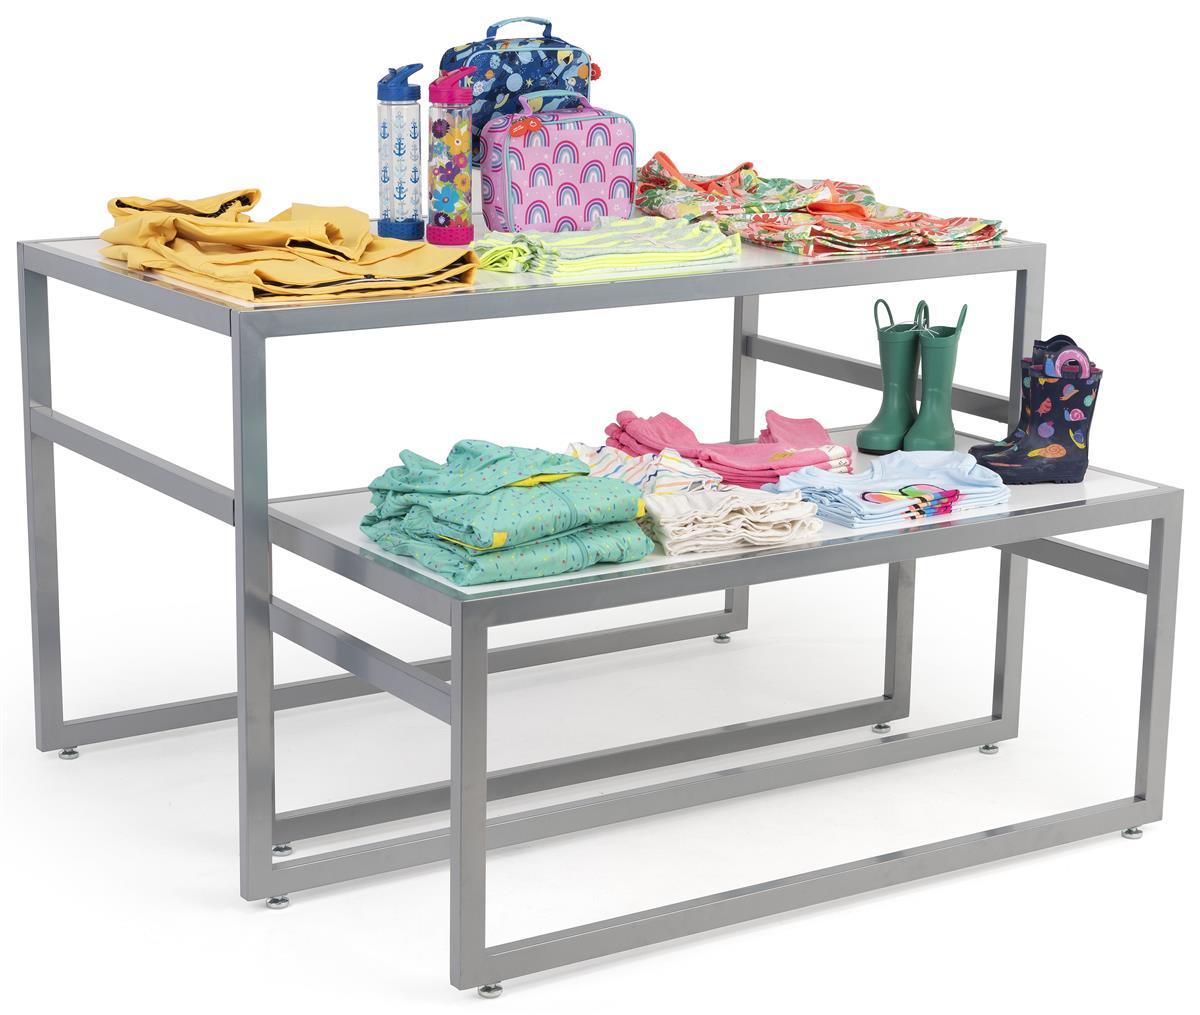 White Nesting Tables Retail Furniture W Contemporary Design